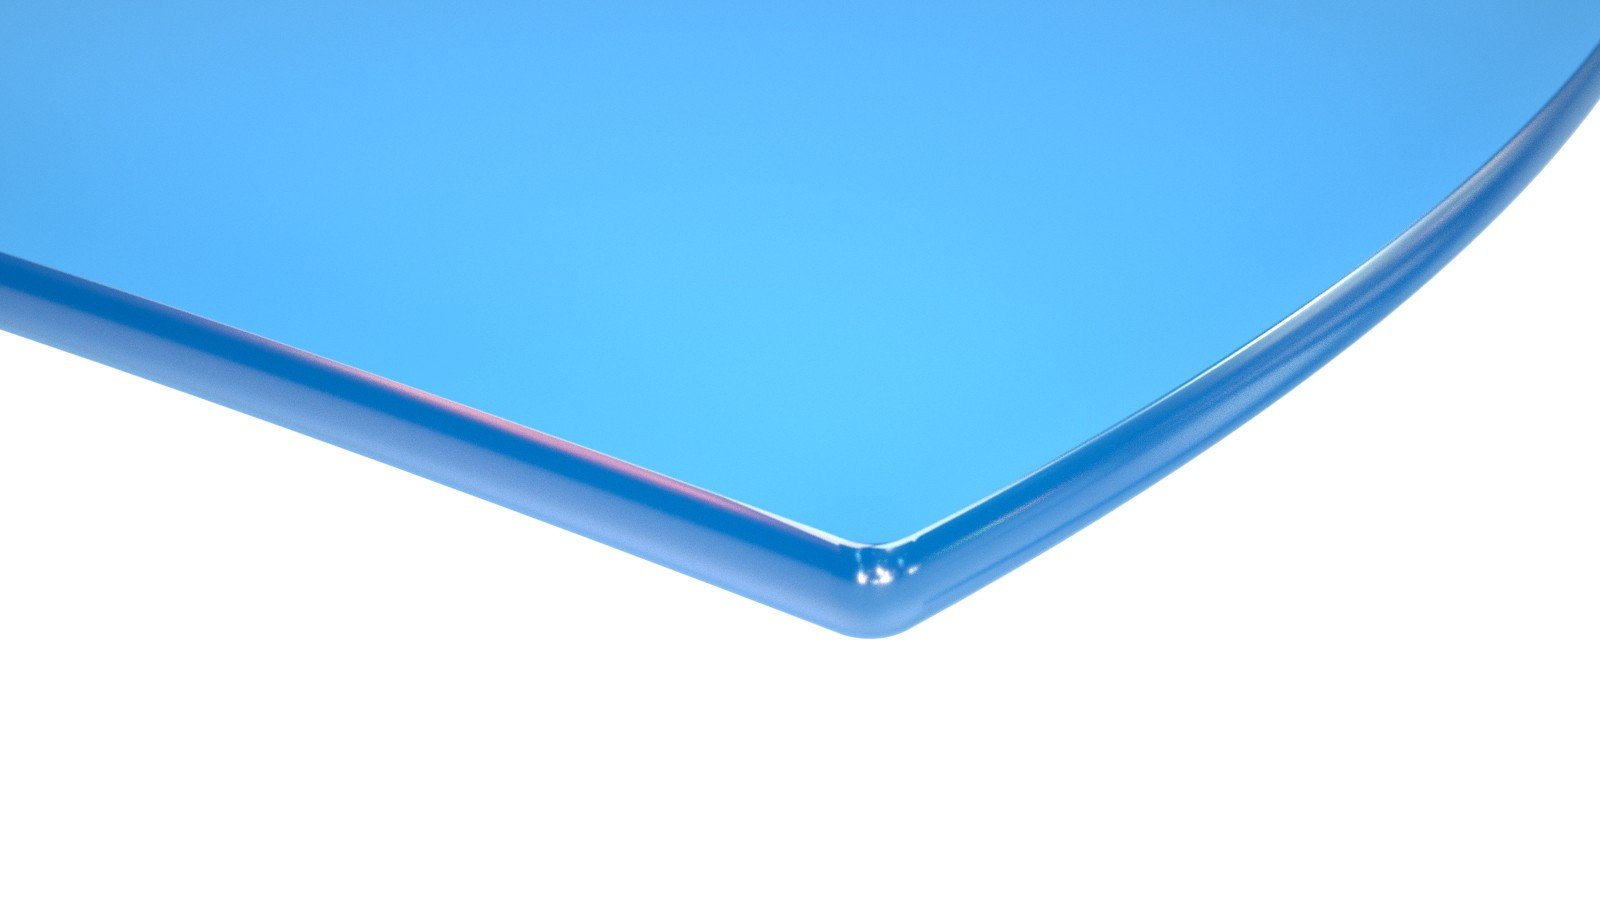 Plexiglas (Acrylic)